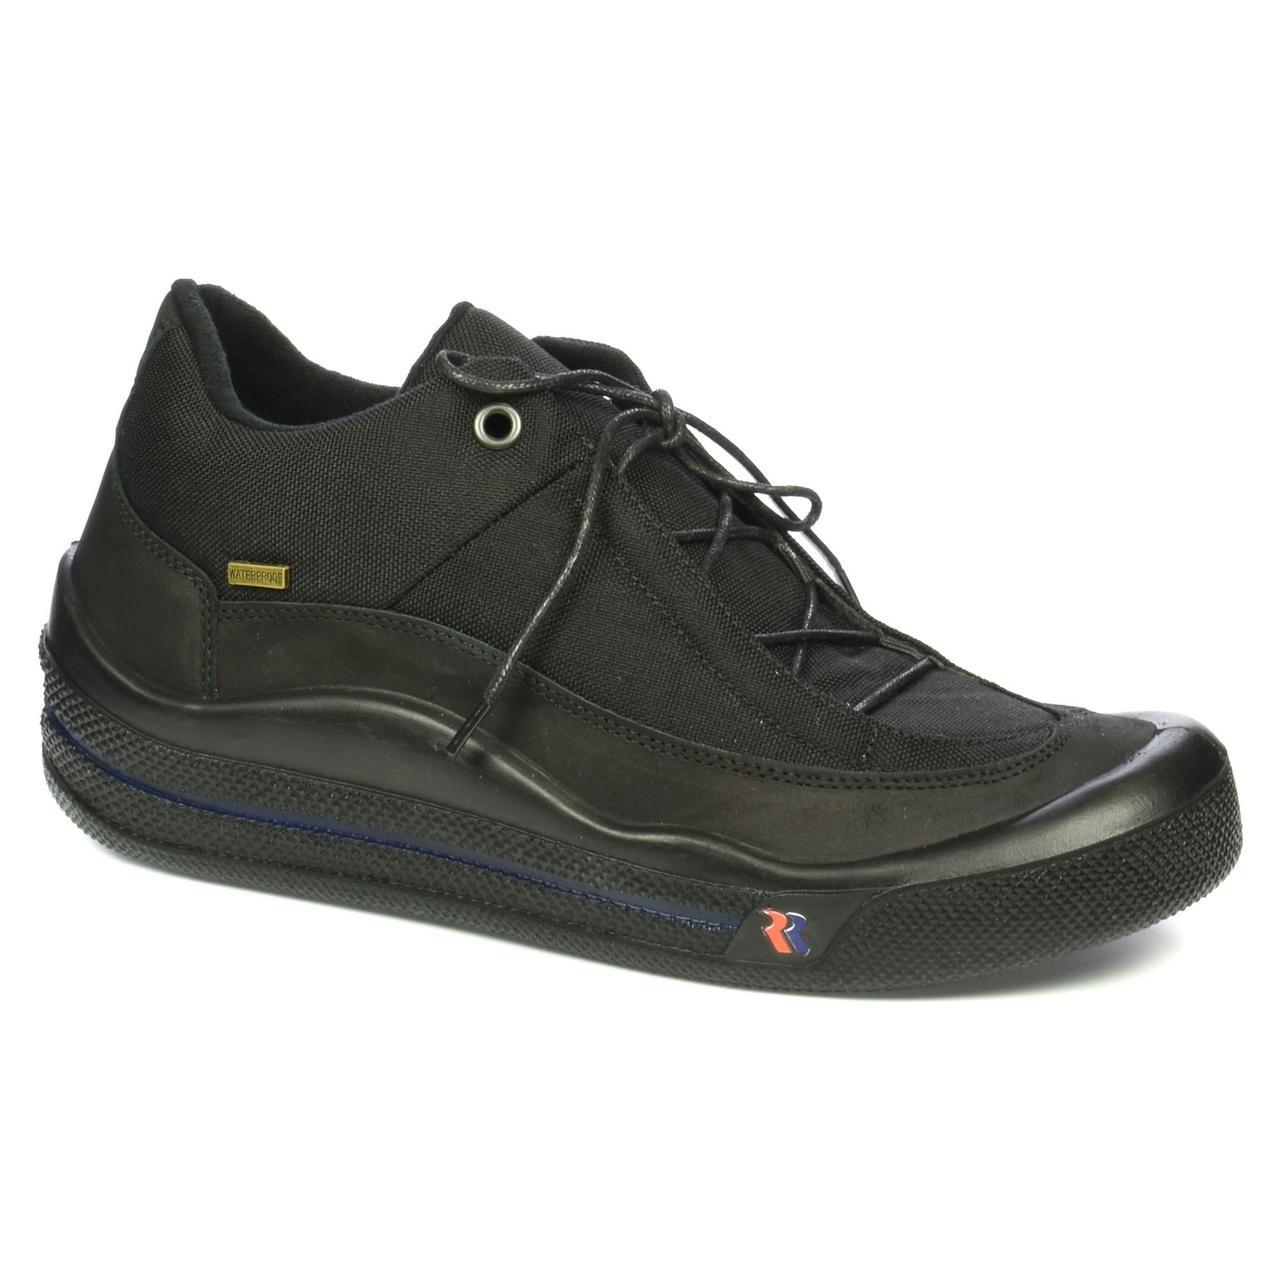 6f34e0cc ROMIKA footwear Tennis M Herren 41R02100, код: 5106, размеры: 41, 43 ...